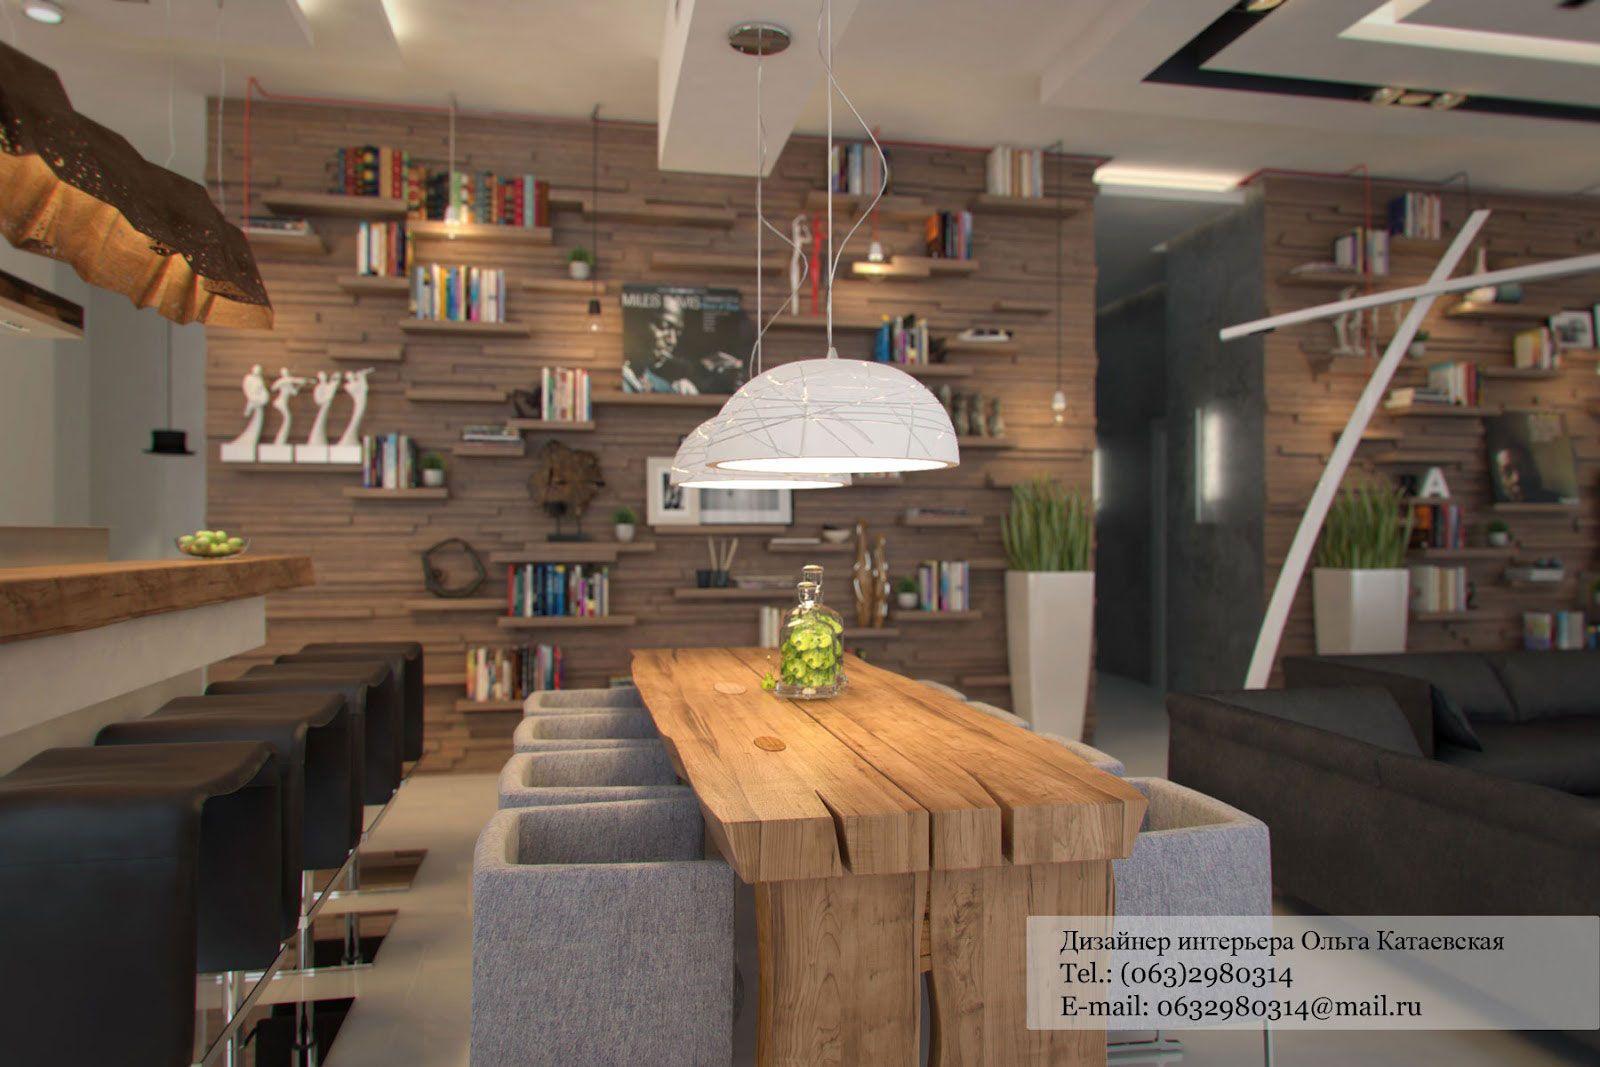 Small Modern Rustic Kitchen Studio Apartment Interior Design Apartment Interior Design Interior Design Rustic Interior Design